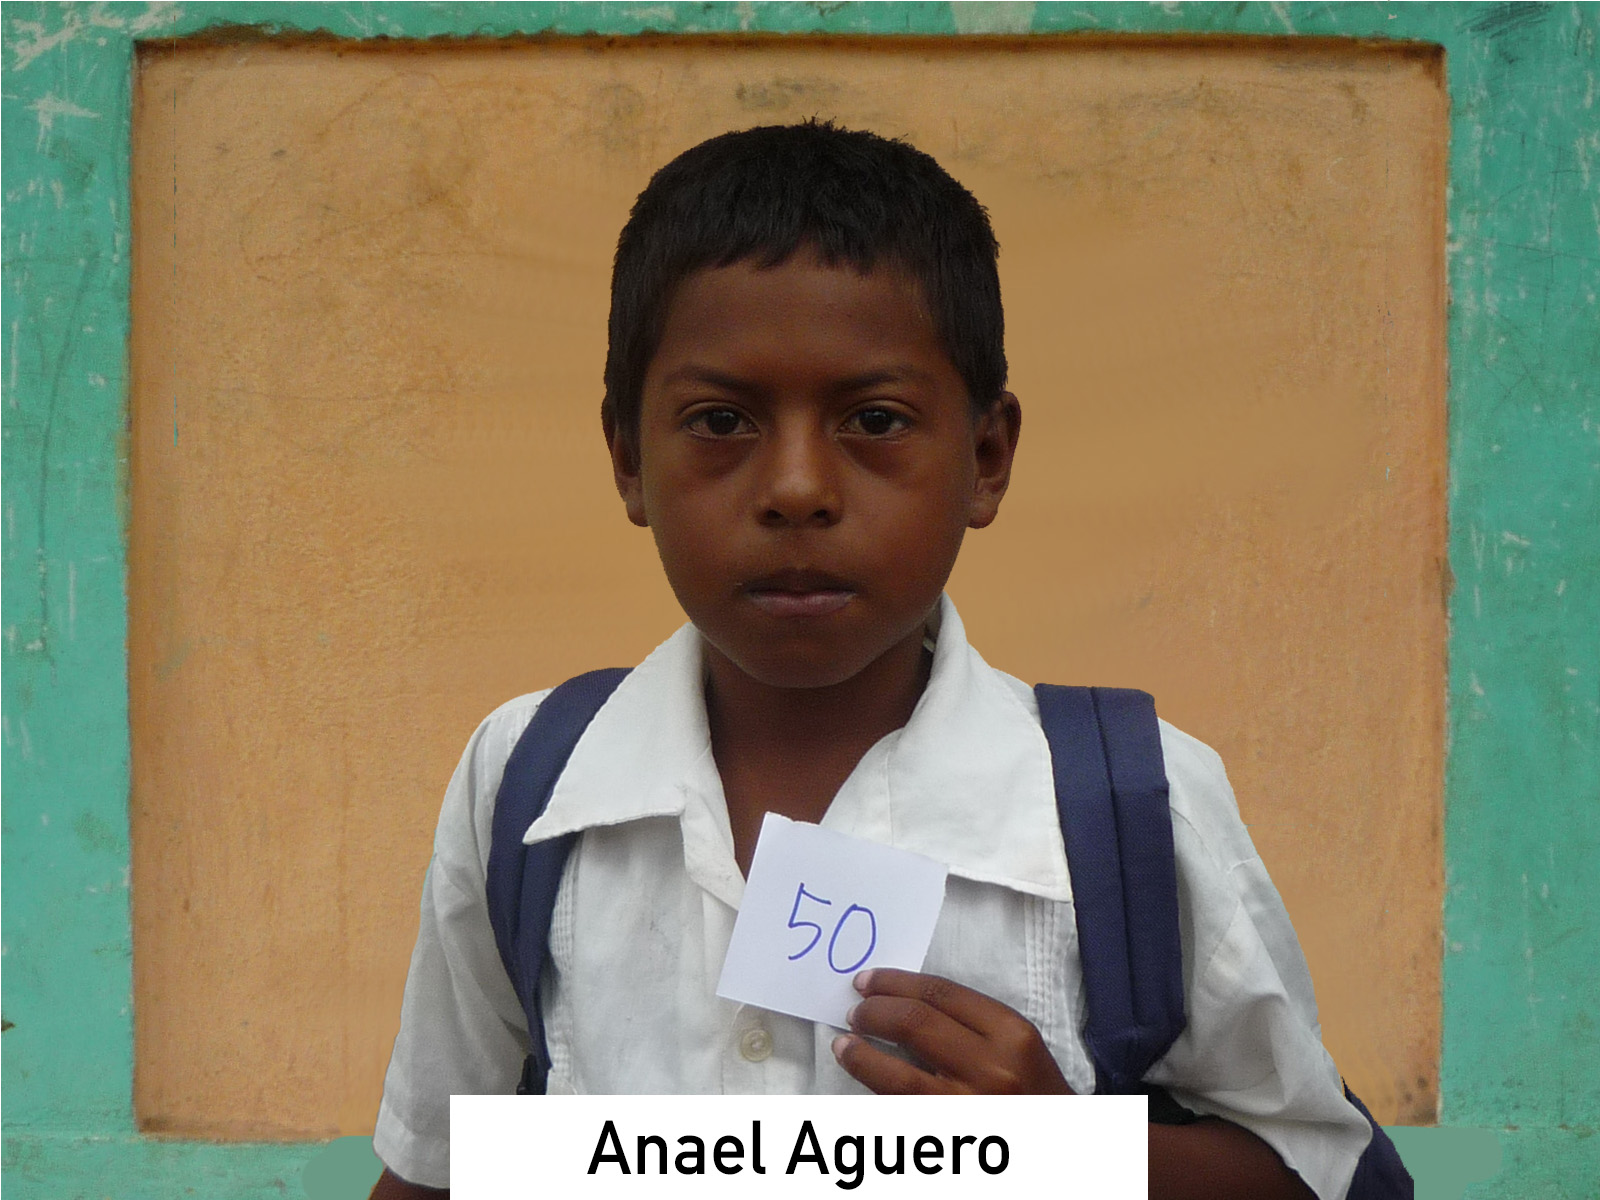 050 - Anael Aguero.jpg